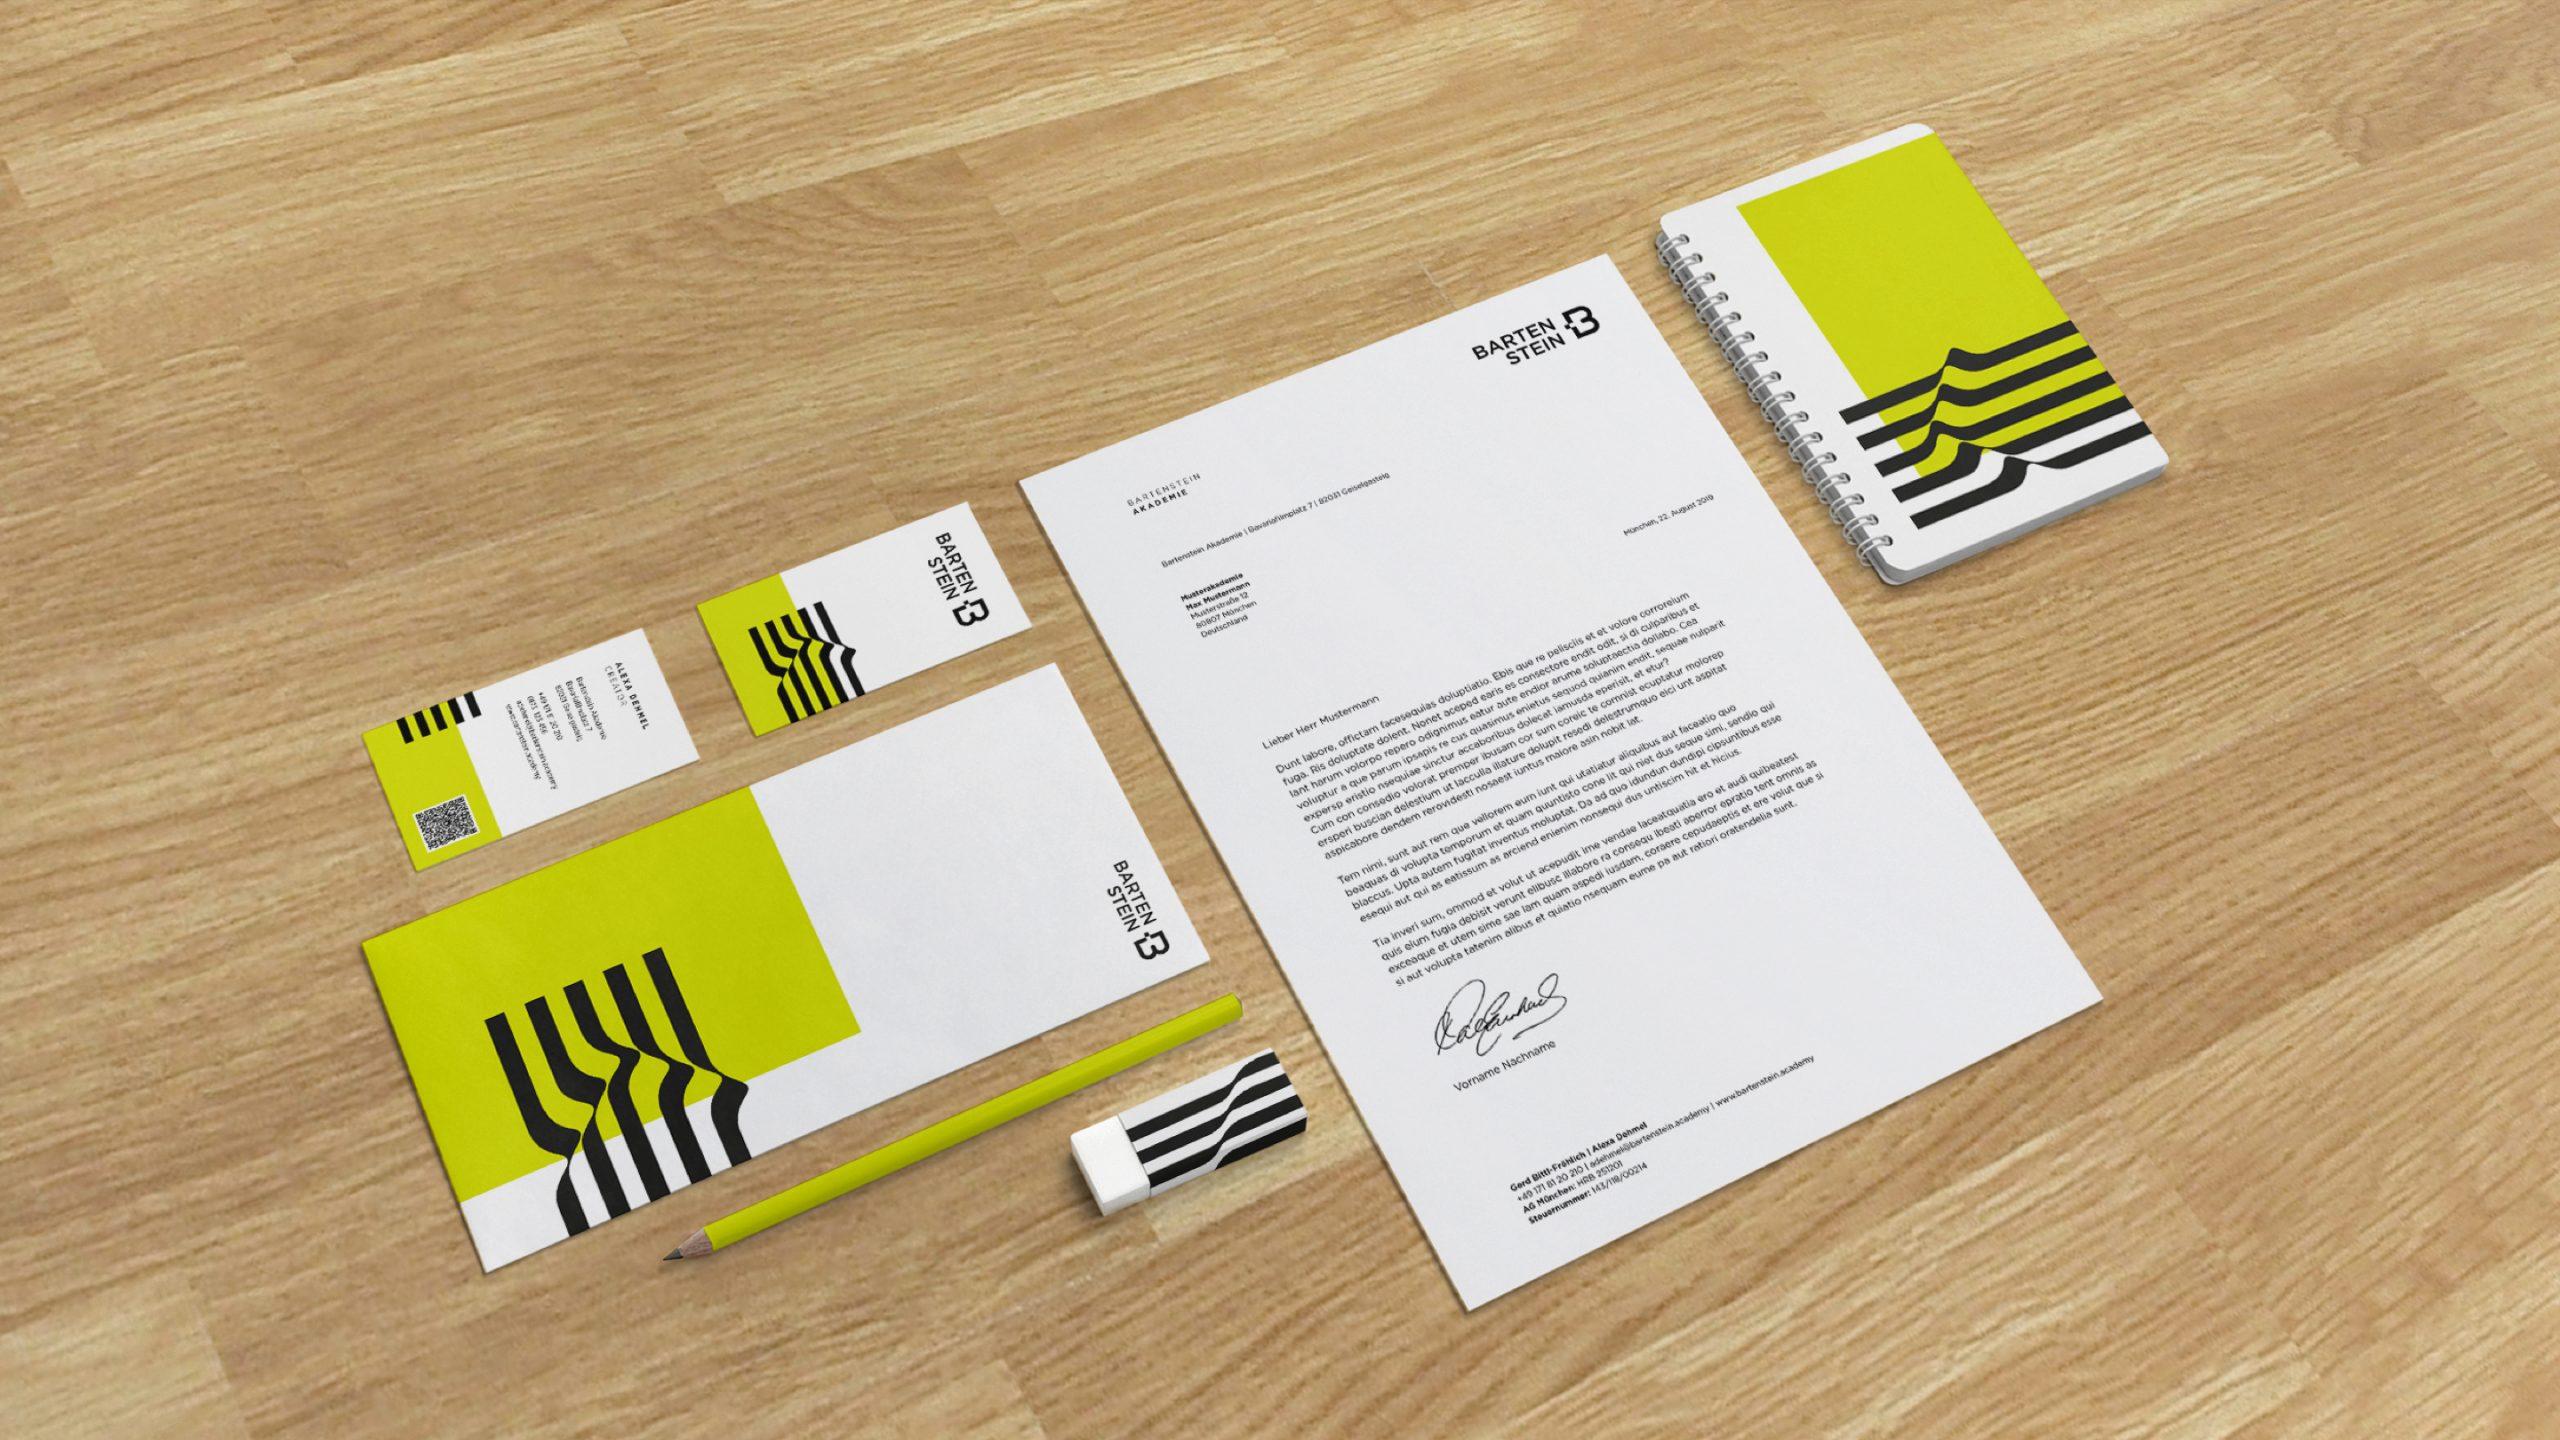 pascher-heinz-bartenstein-relaunch-print-02